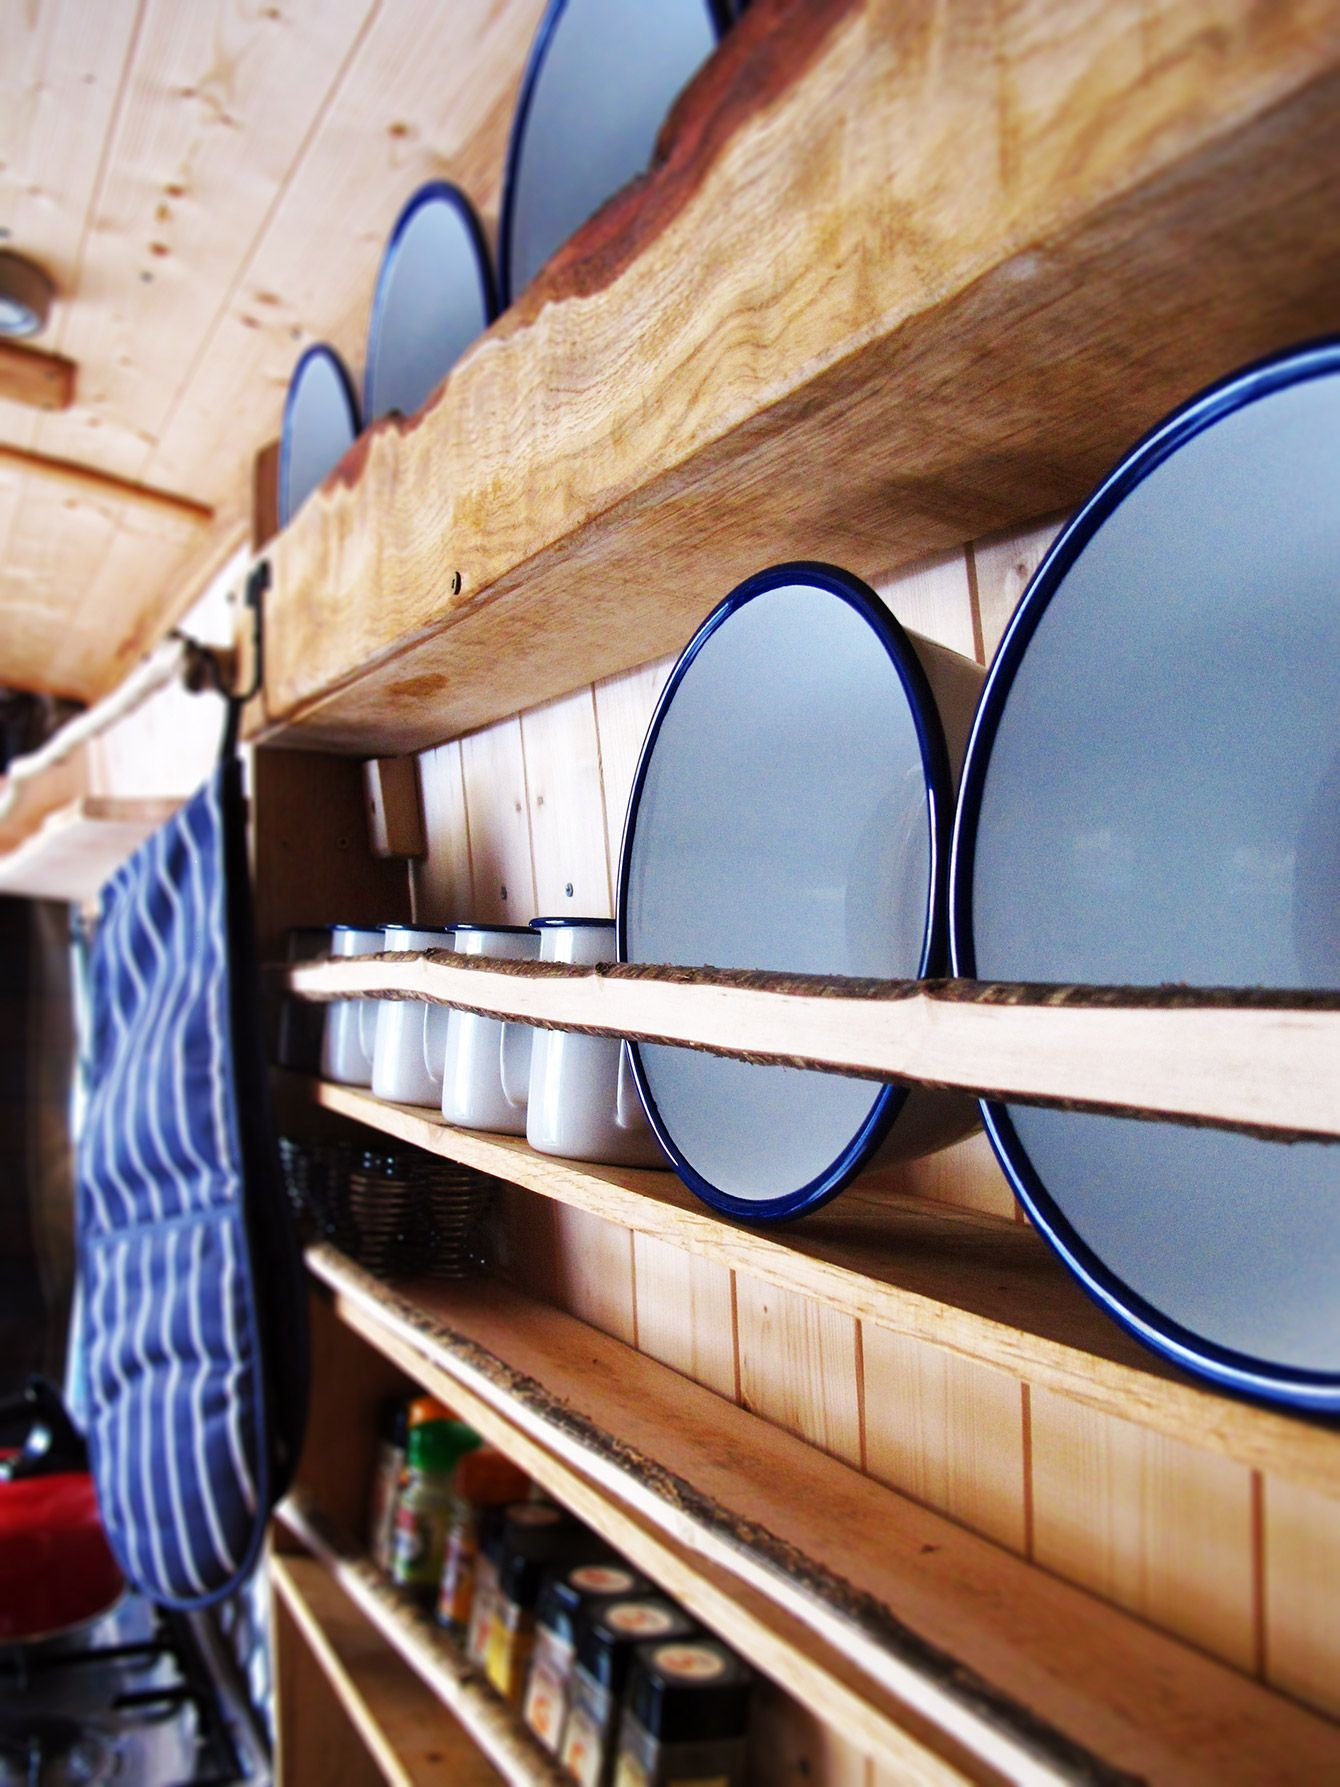 Geschirr-aufbewahrung Im Camping-bus. | Rv Ideas | Pinterest ... Coole Ideen Innenausbau